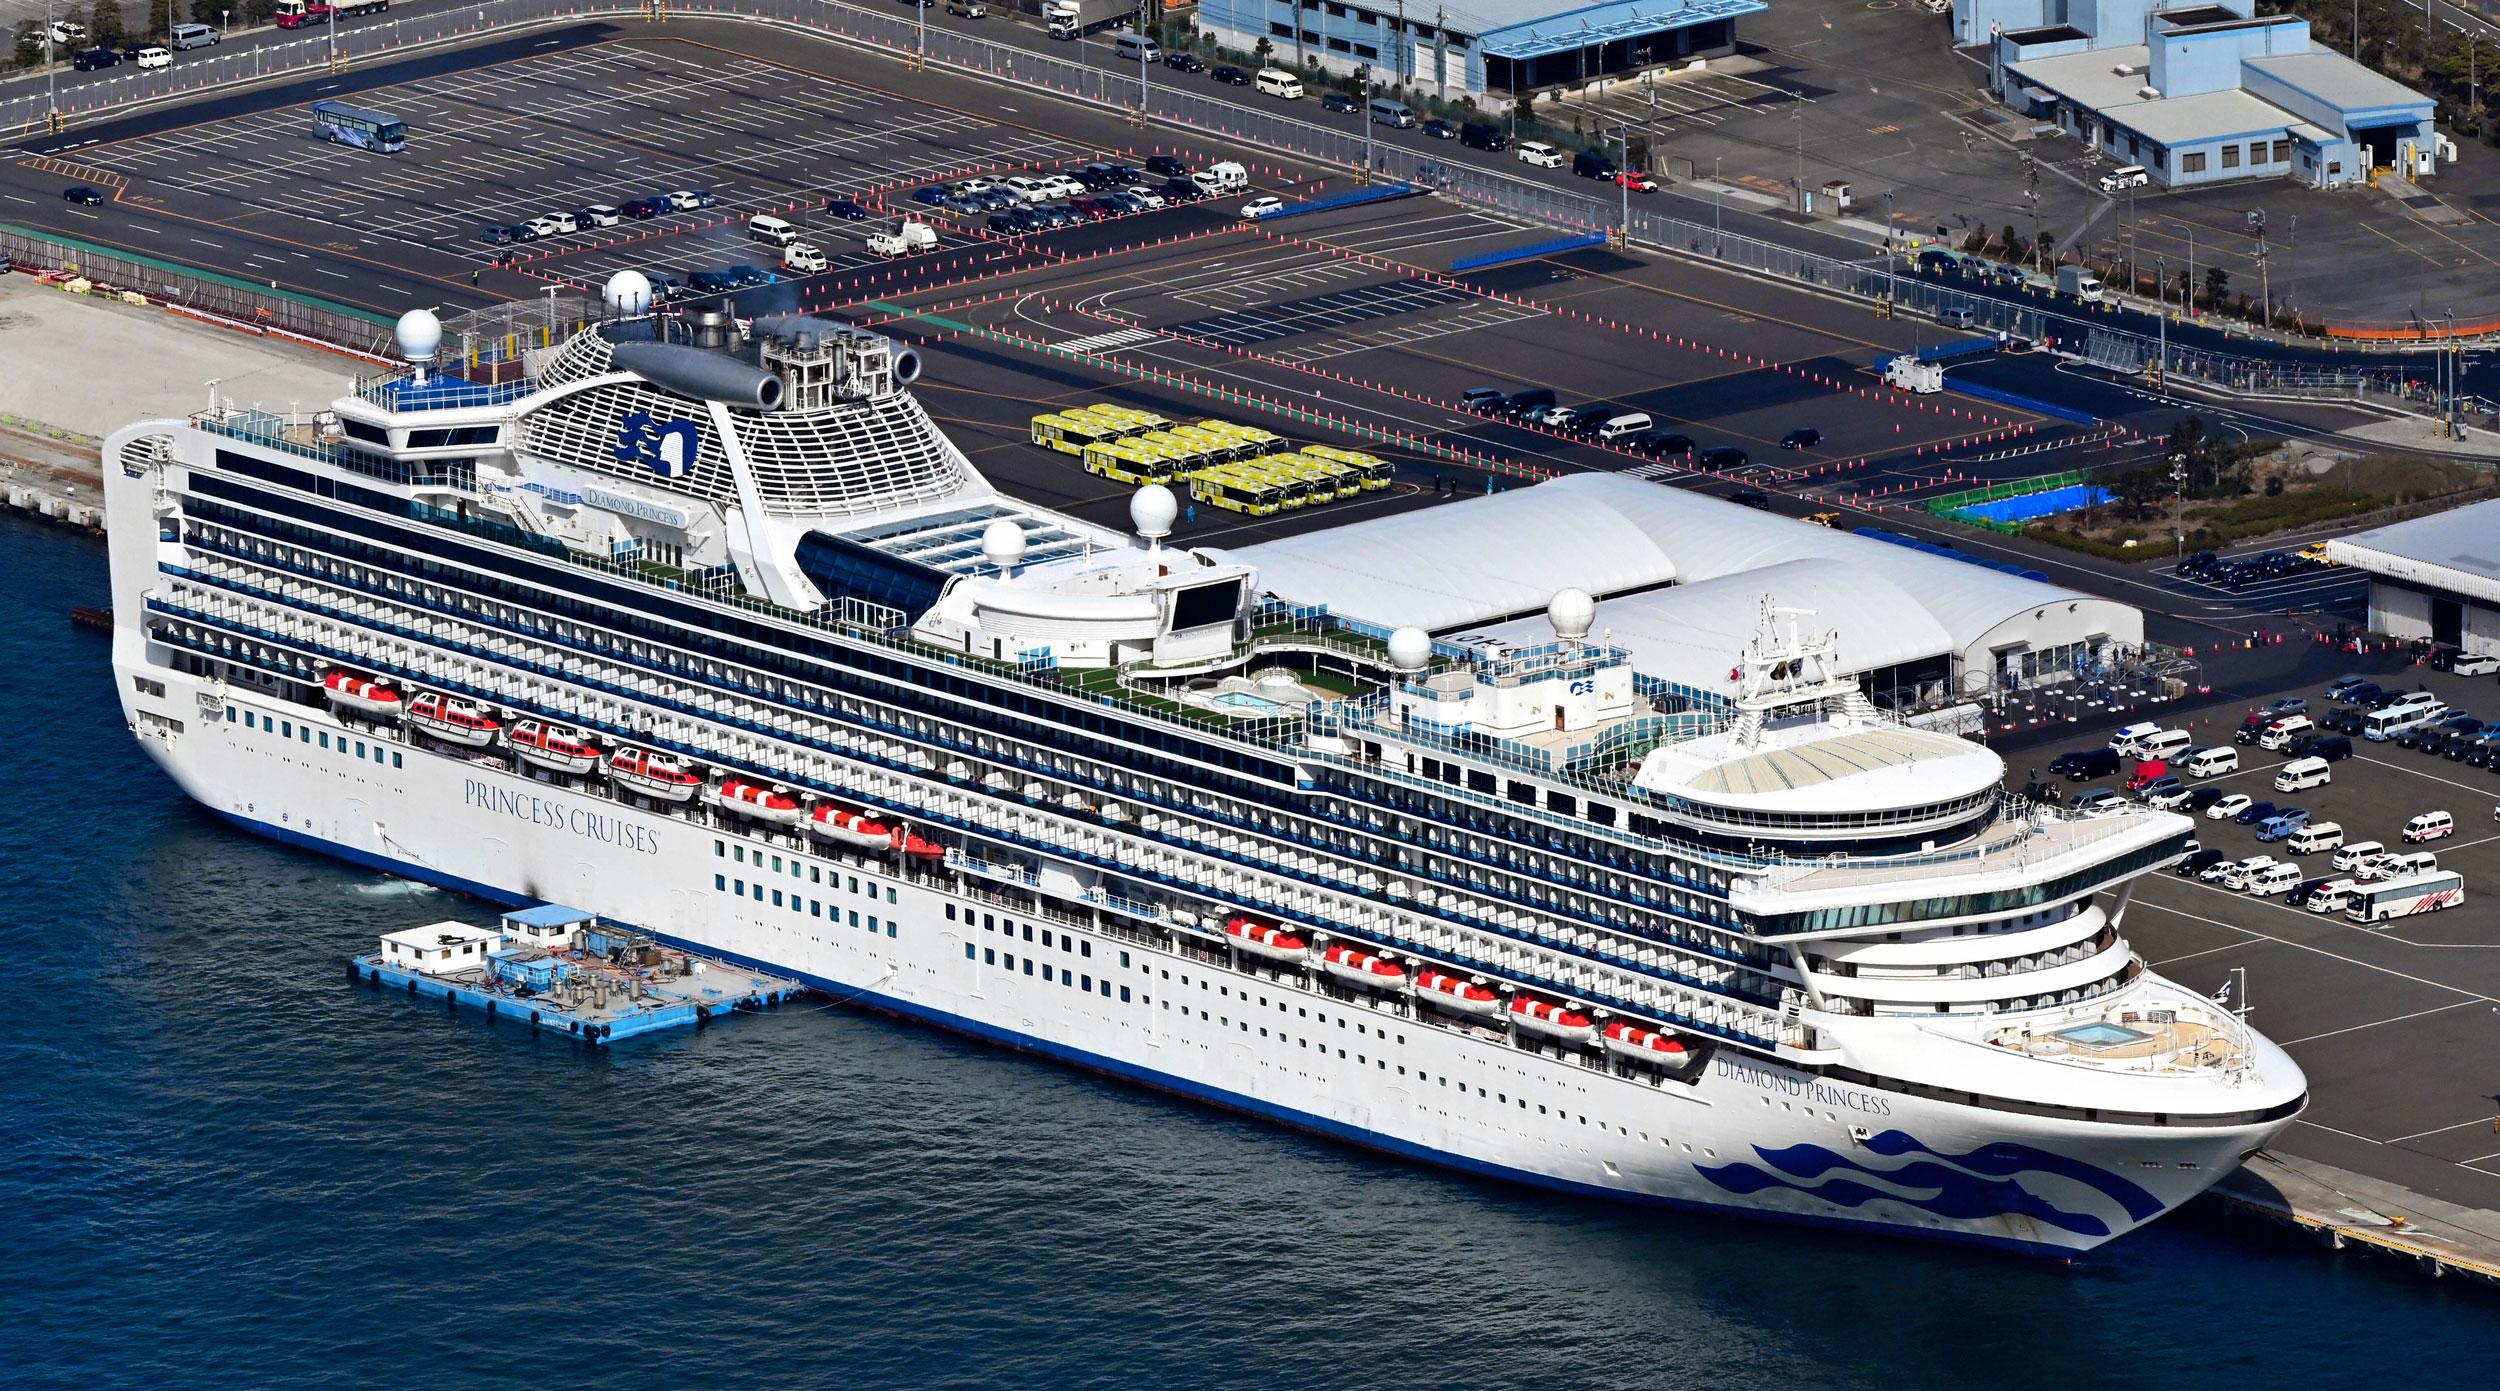 کشتی تفریحی دیاموند پرنسس در بندر یوکوهاما